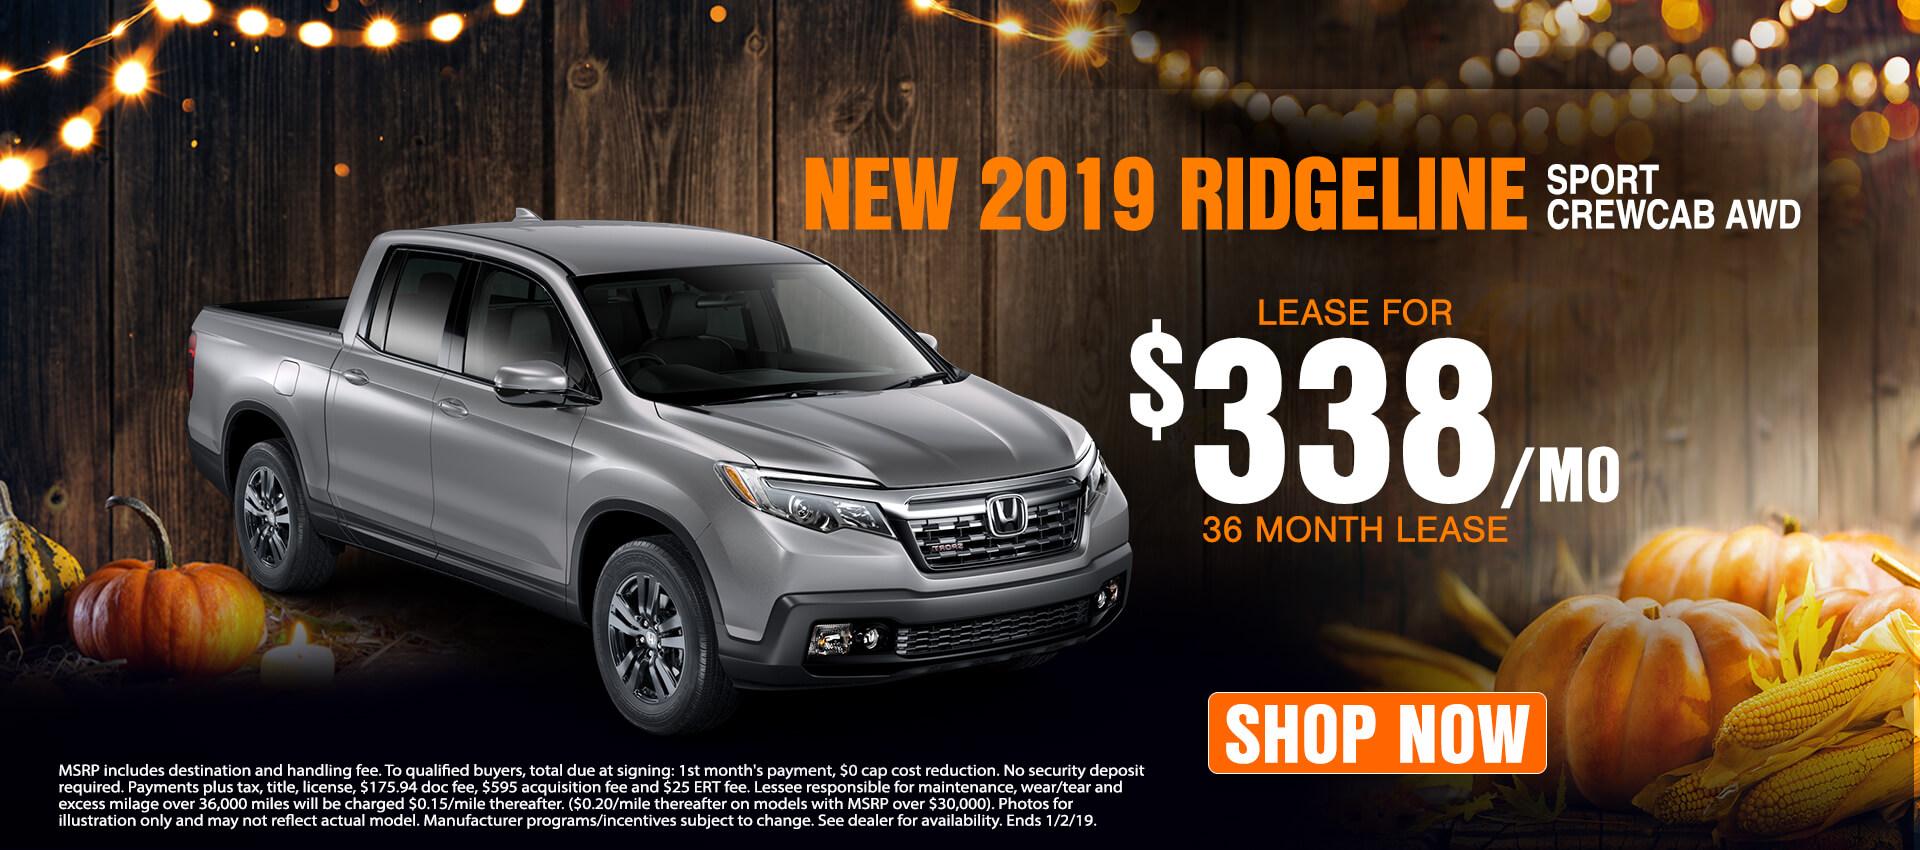 2019 Ridgeline $338 Lease